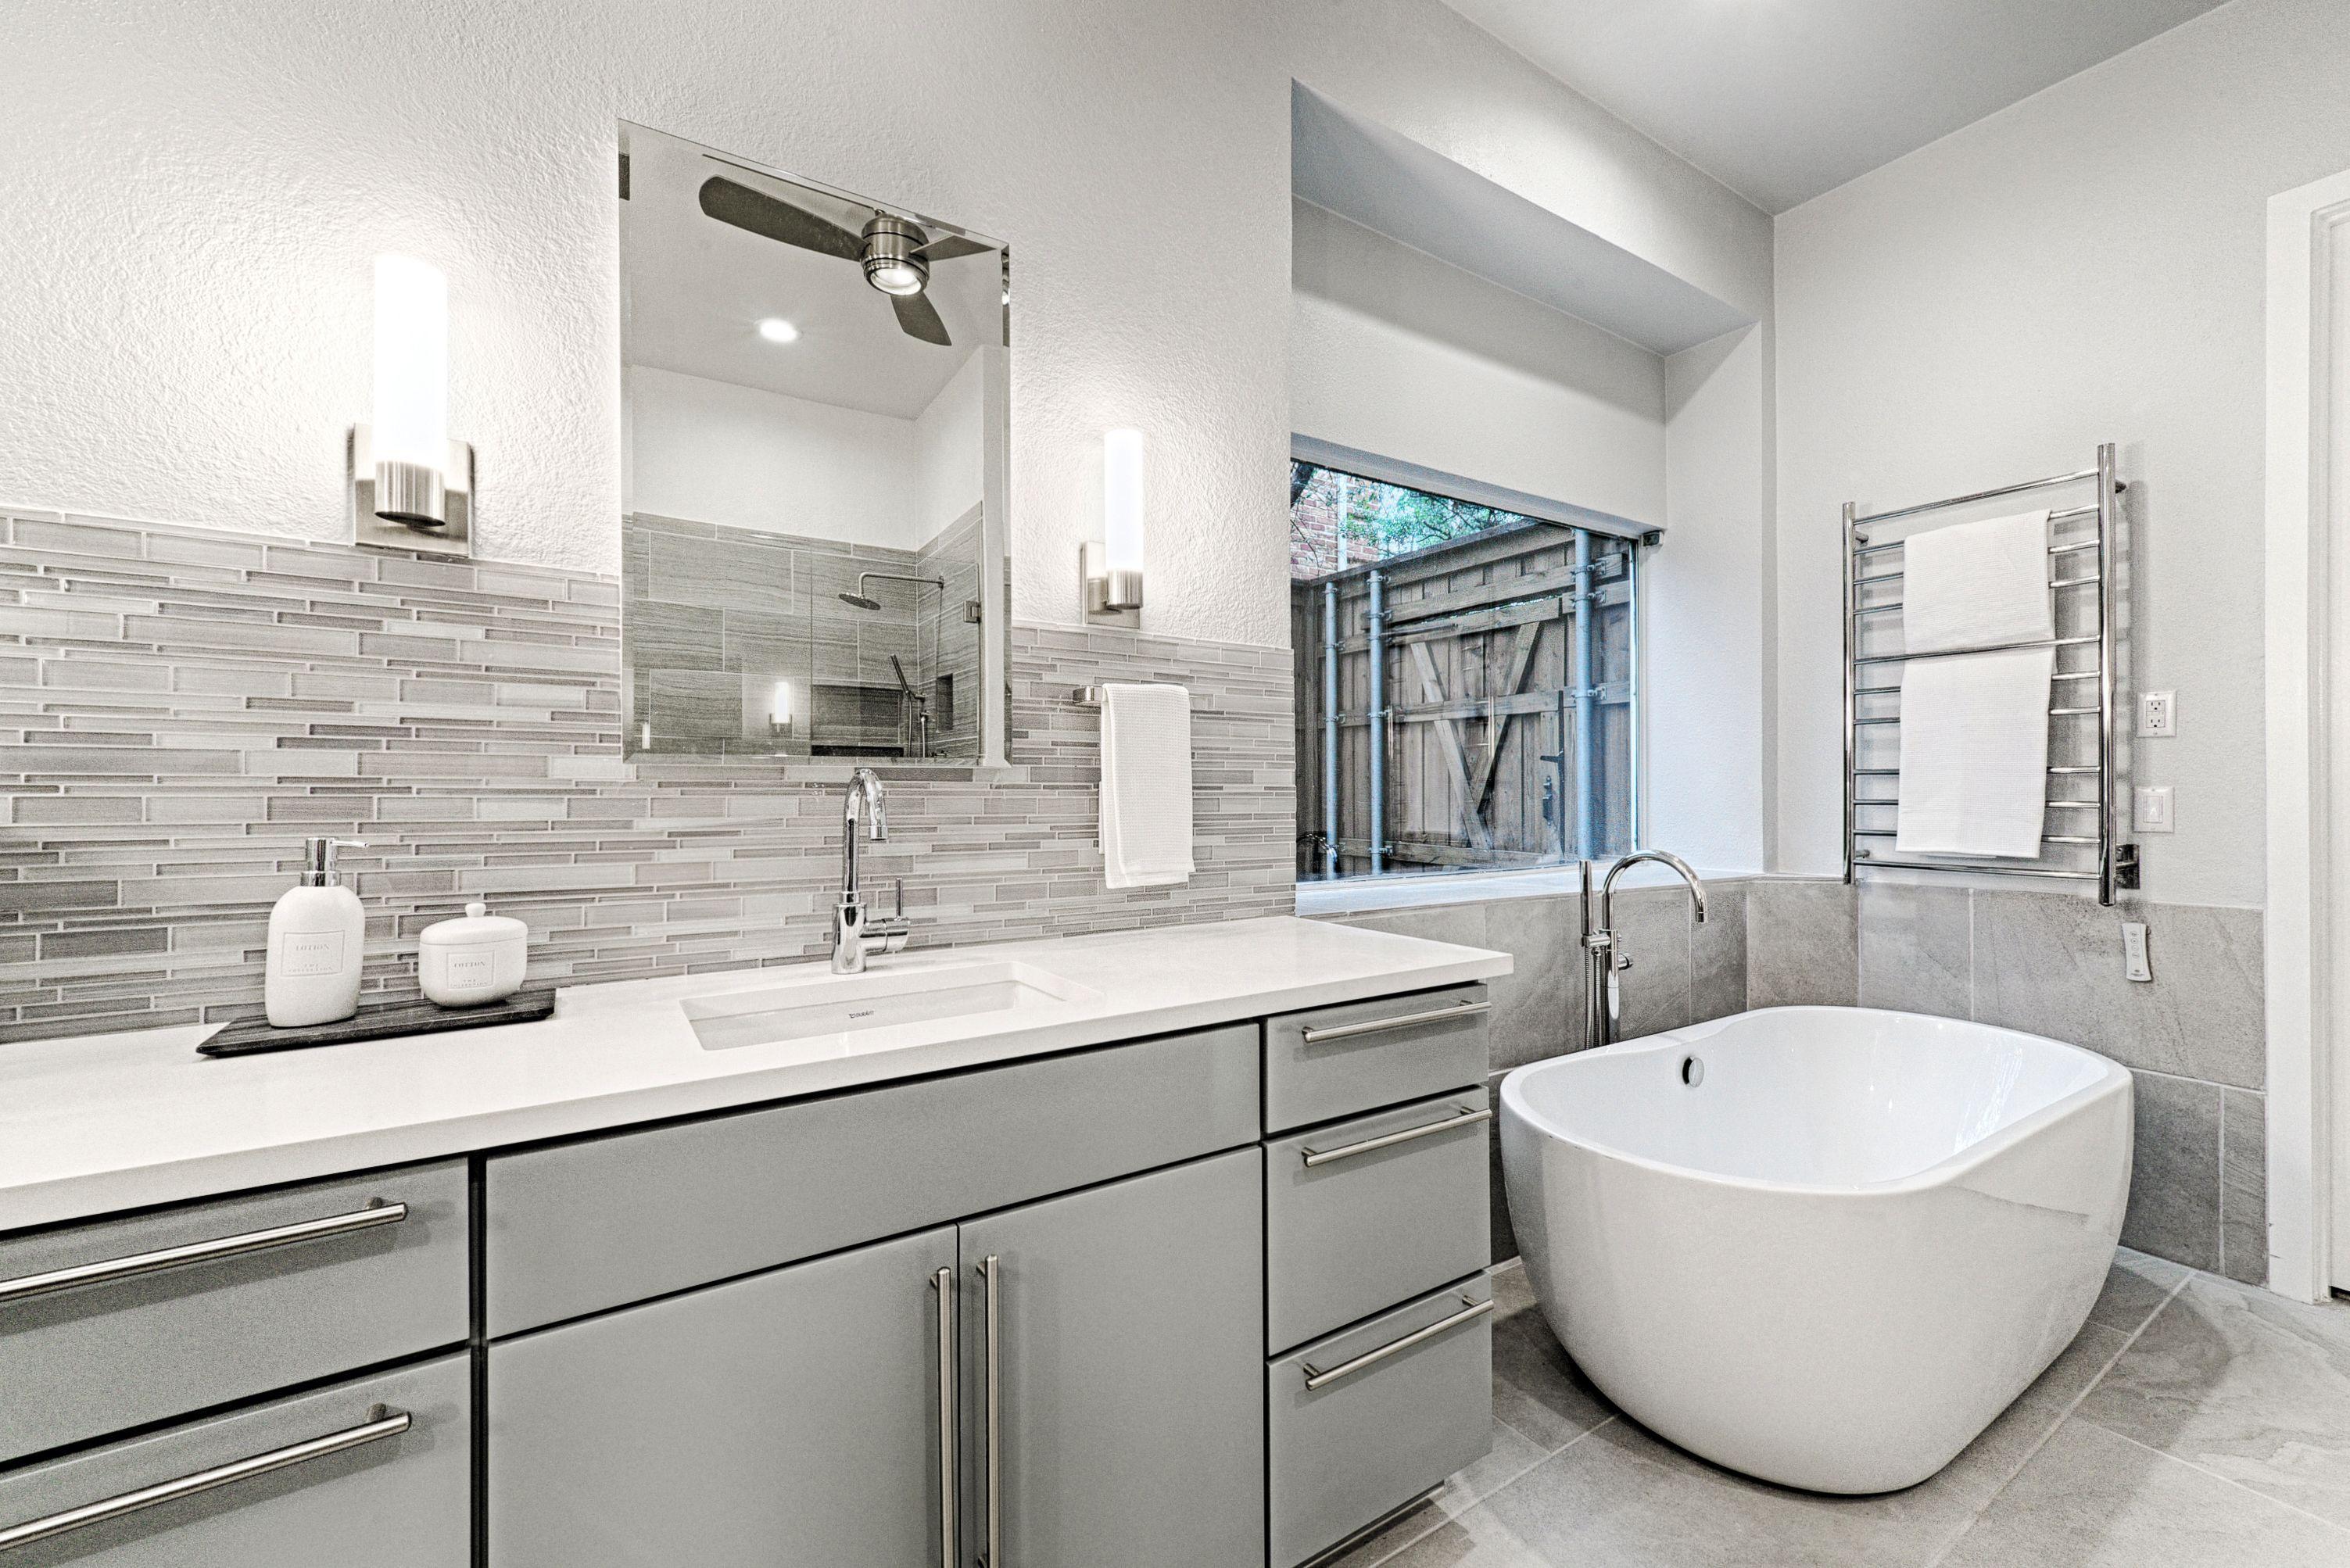 gorgeous bath remodel with freestanding tub and glass backsplash